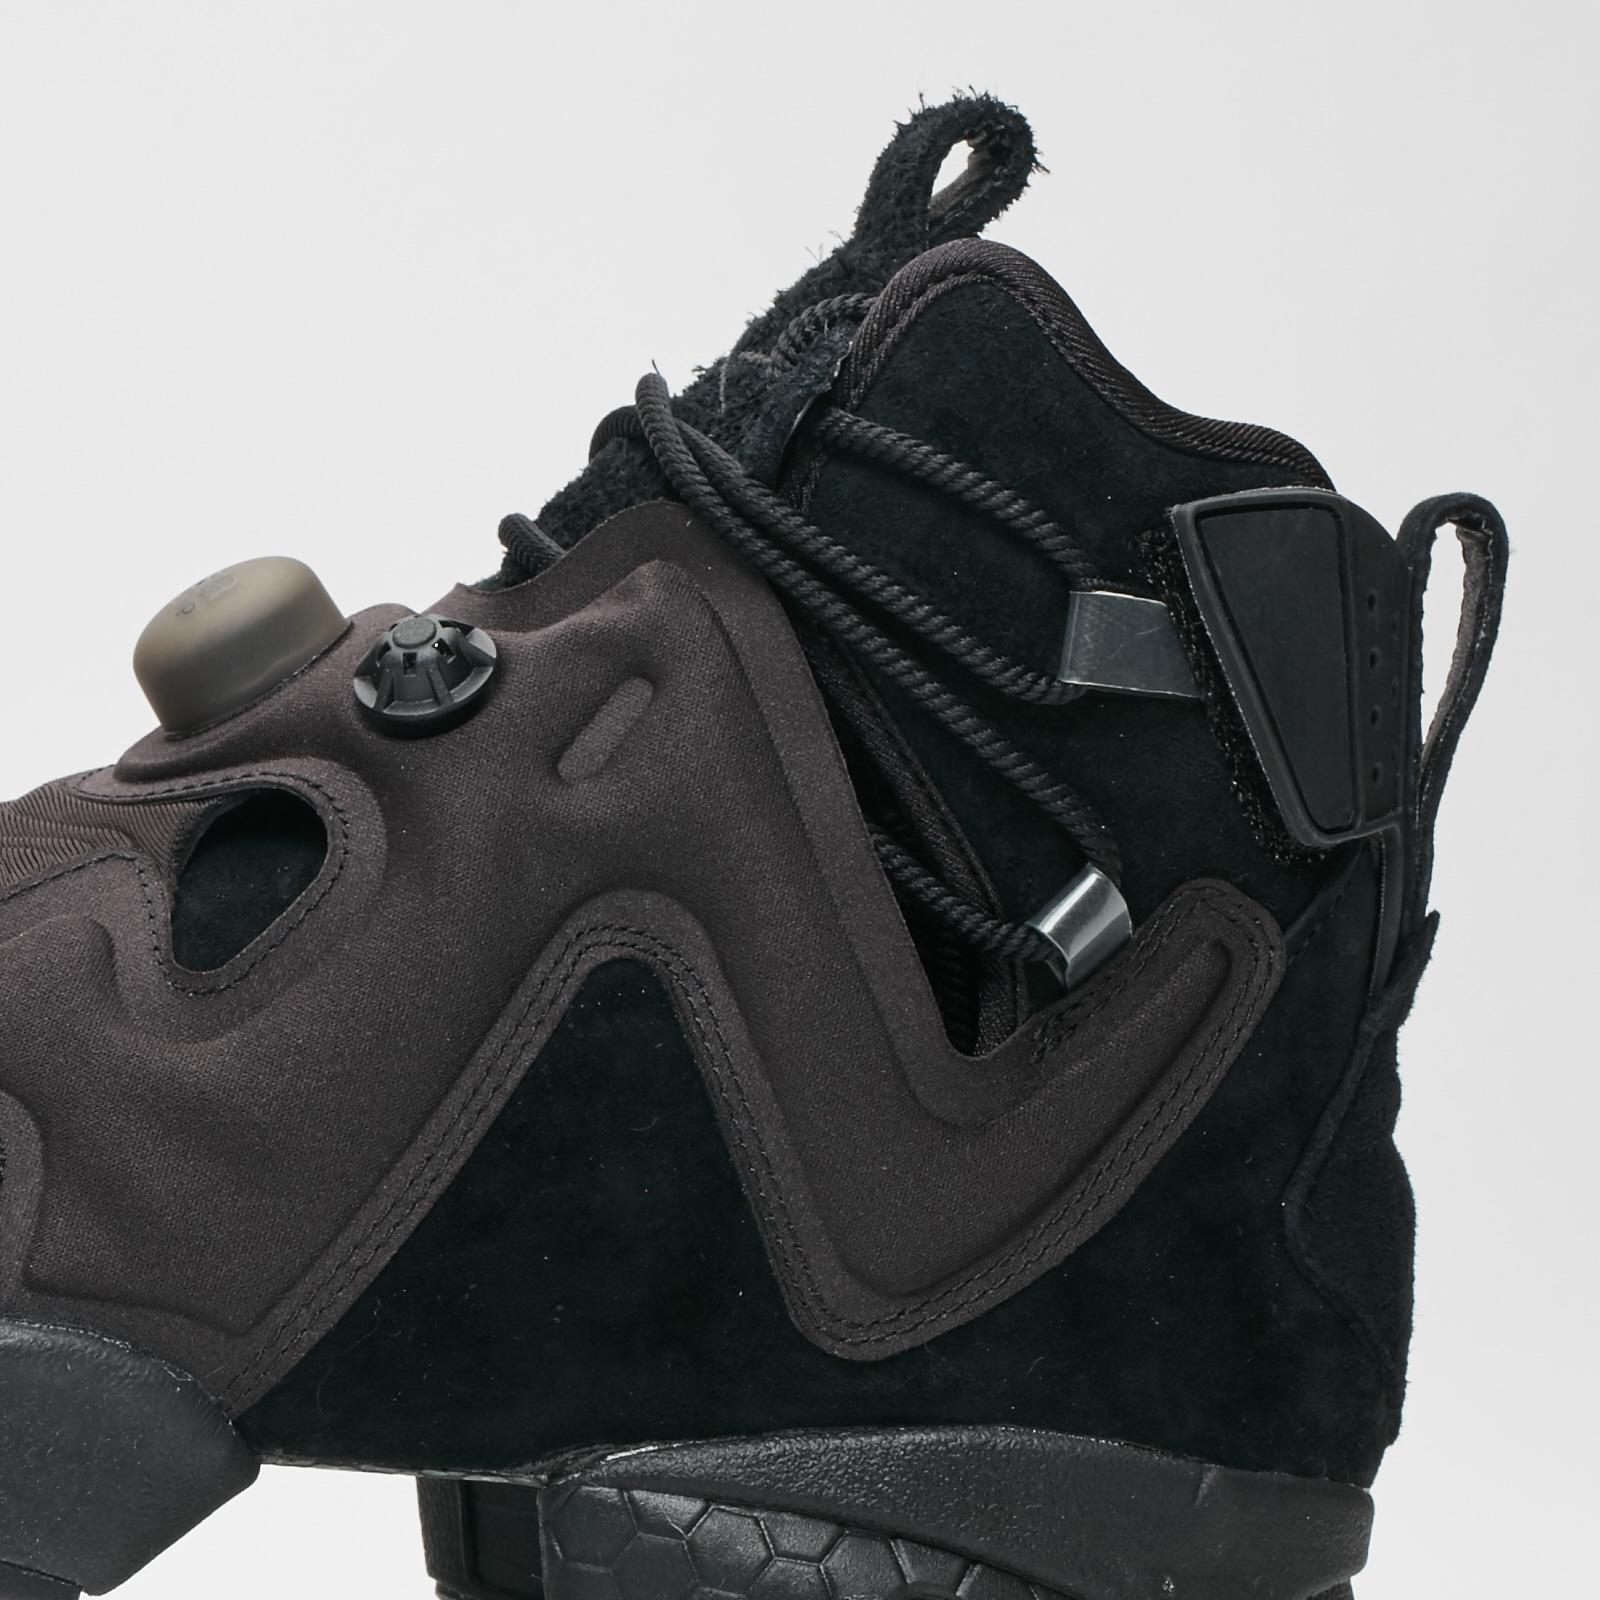 Reebok Furikaze x Future - Bs7420 - Sneakersnstuff  be87667df